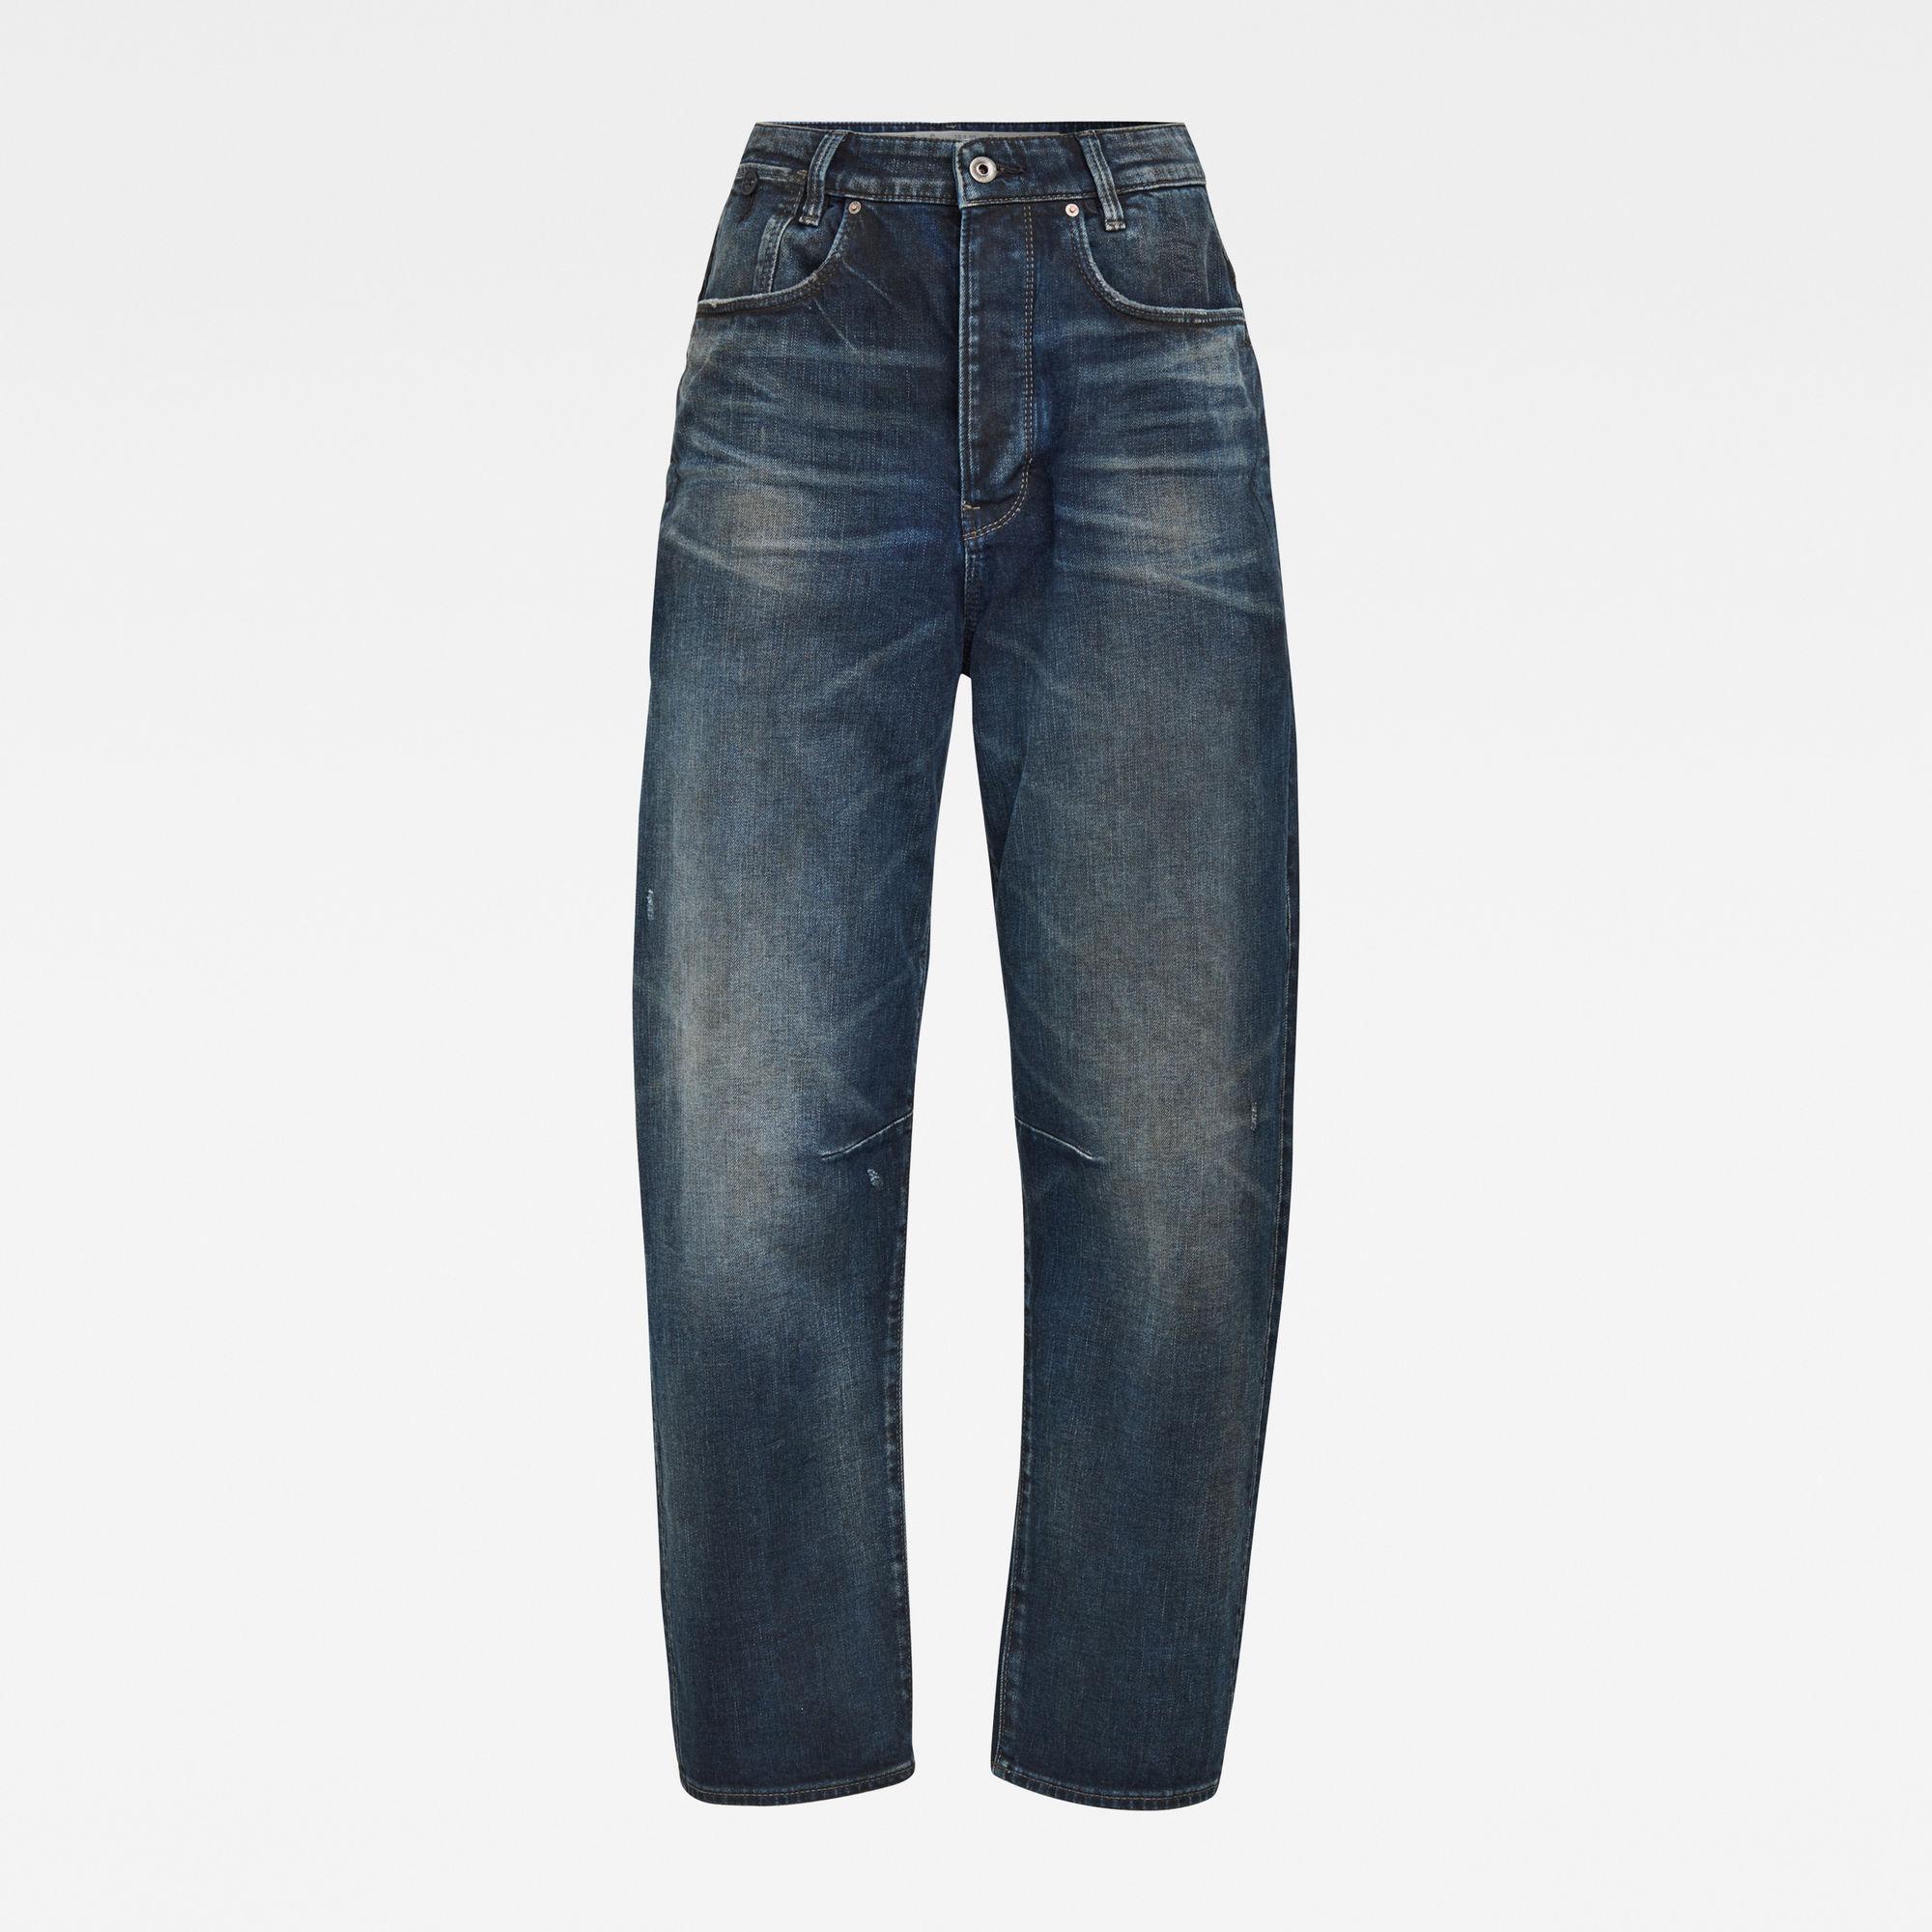 G-Star RAW Dames C-Staq 3D Boyfriend Crop Jeans Donkerblauw